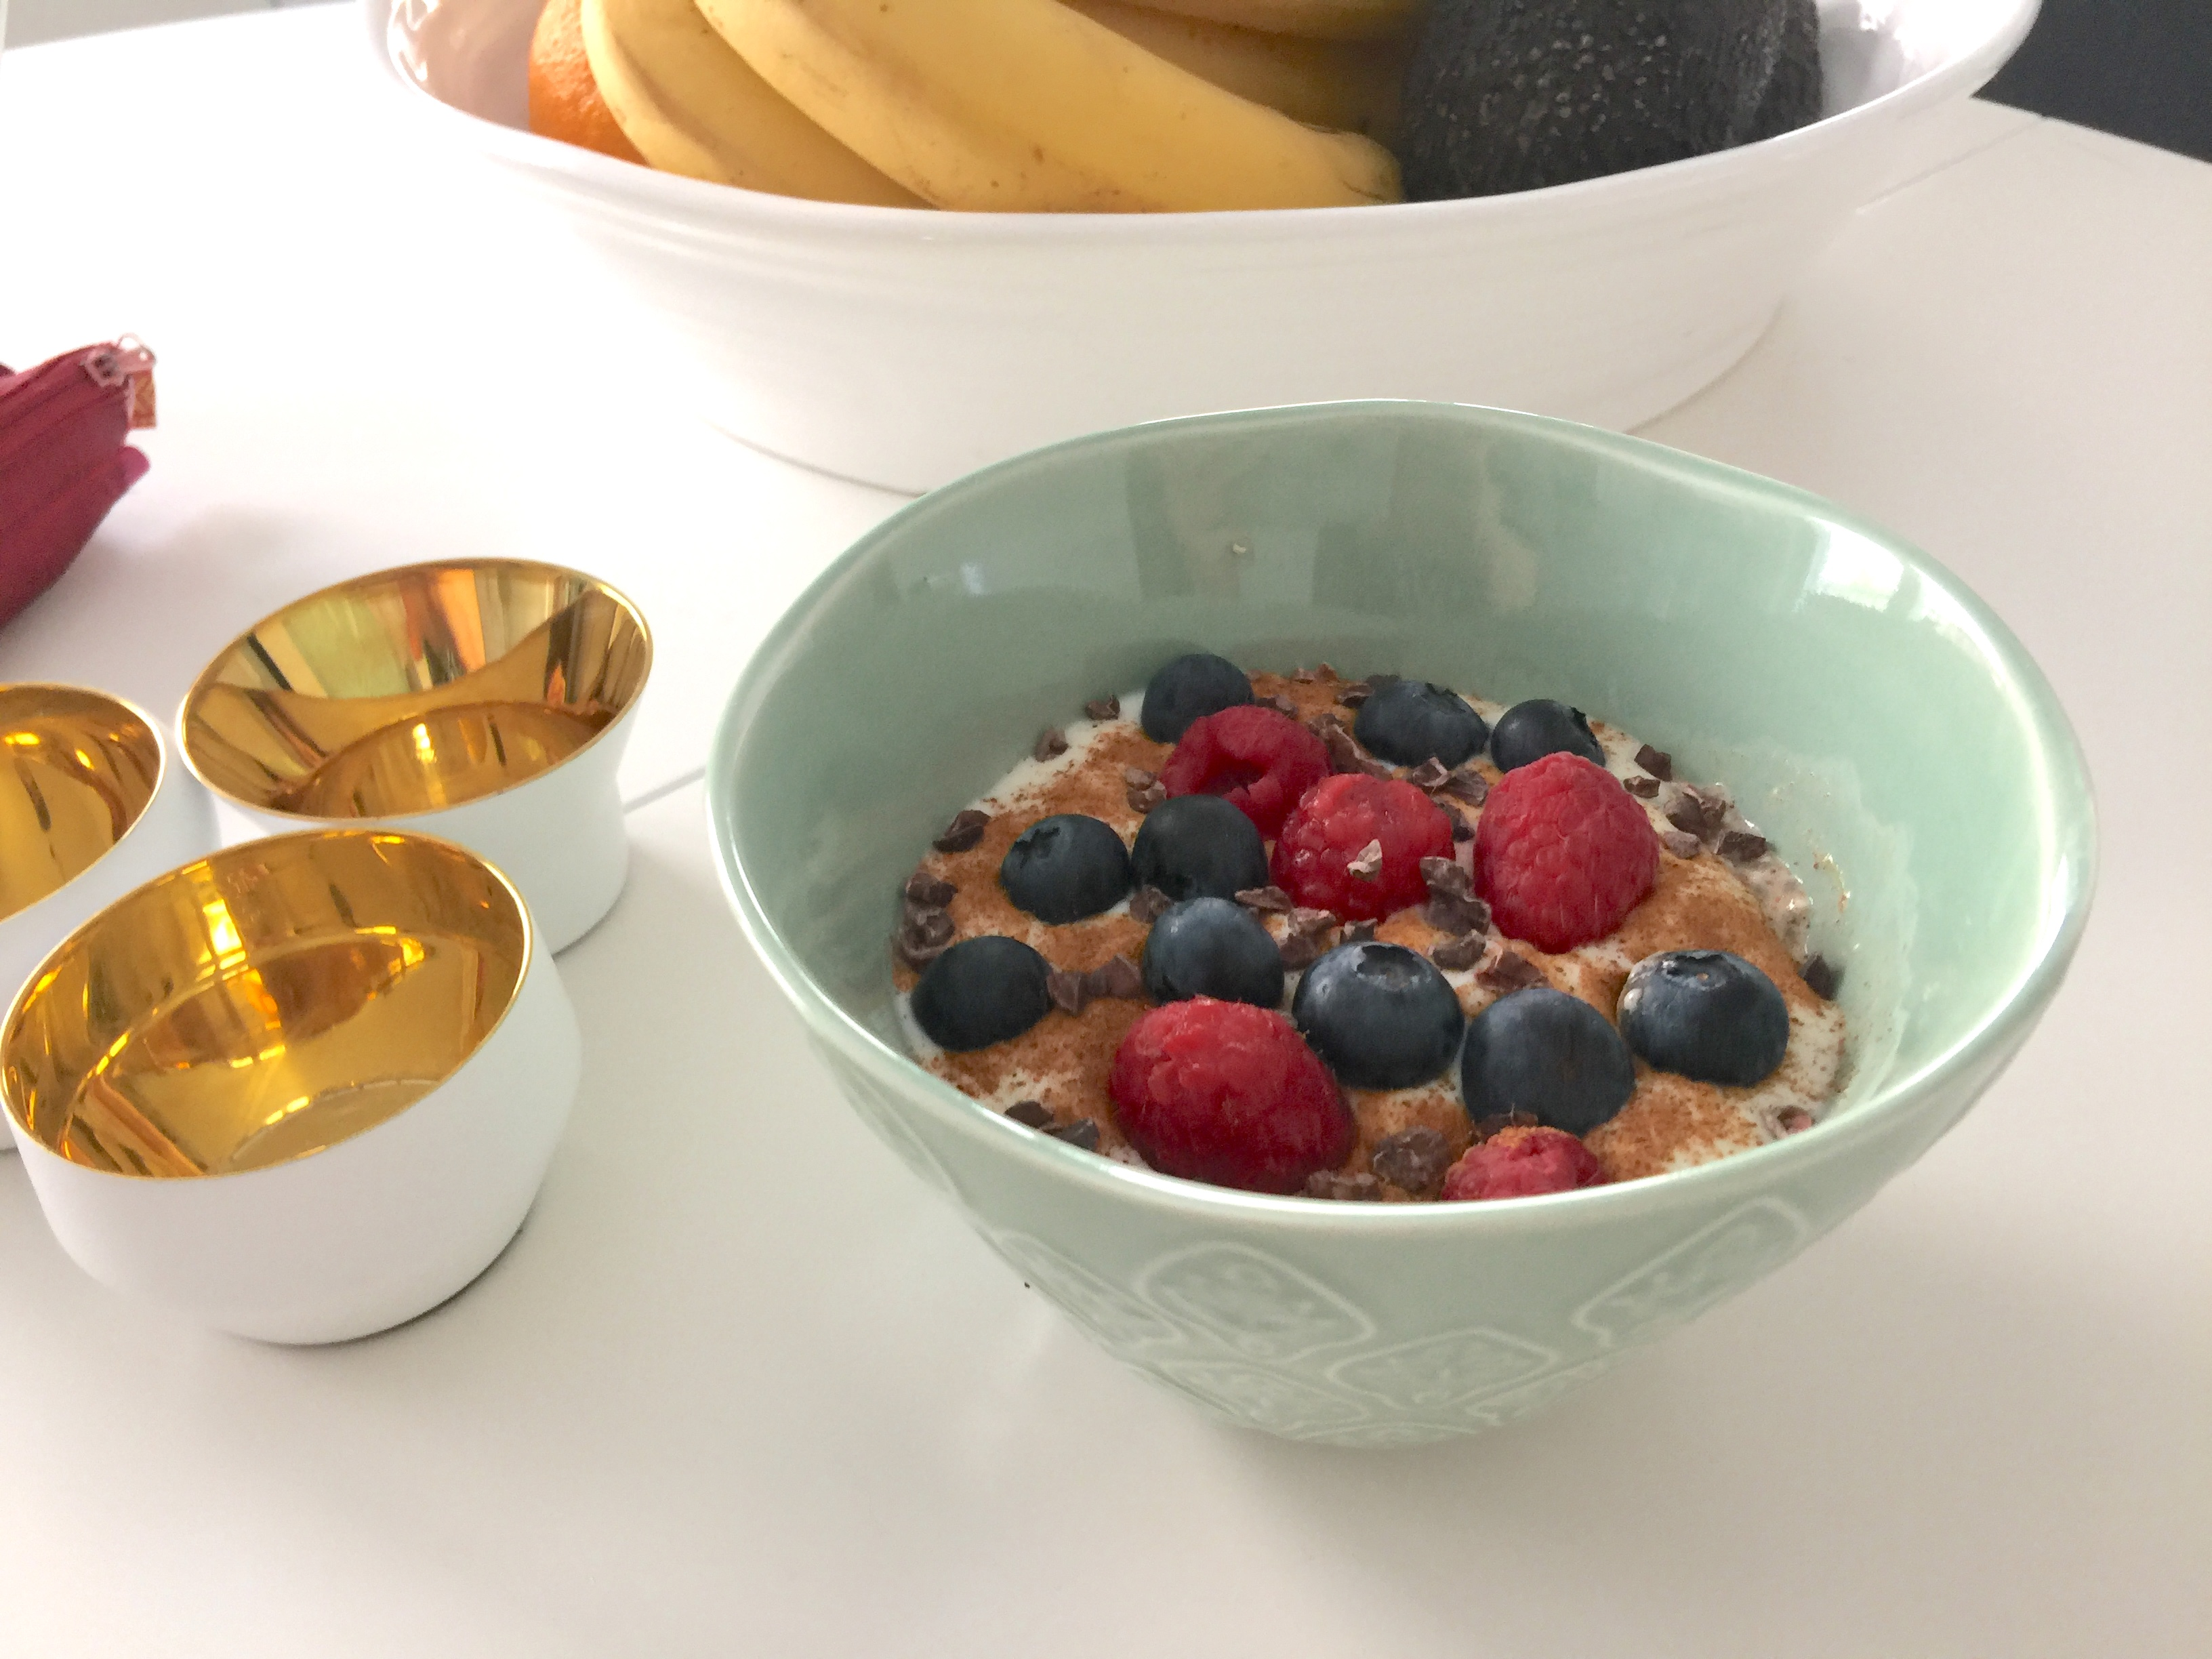 recette petit d jeuner vegan overnight oats le carnet d 39 anne so. Black Bedroom Furniture Sets. Home Design Ideas